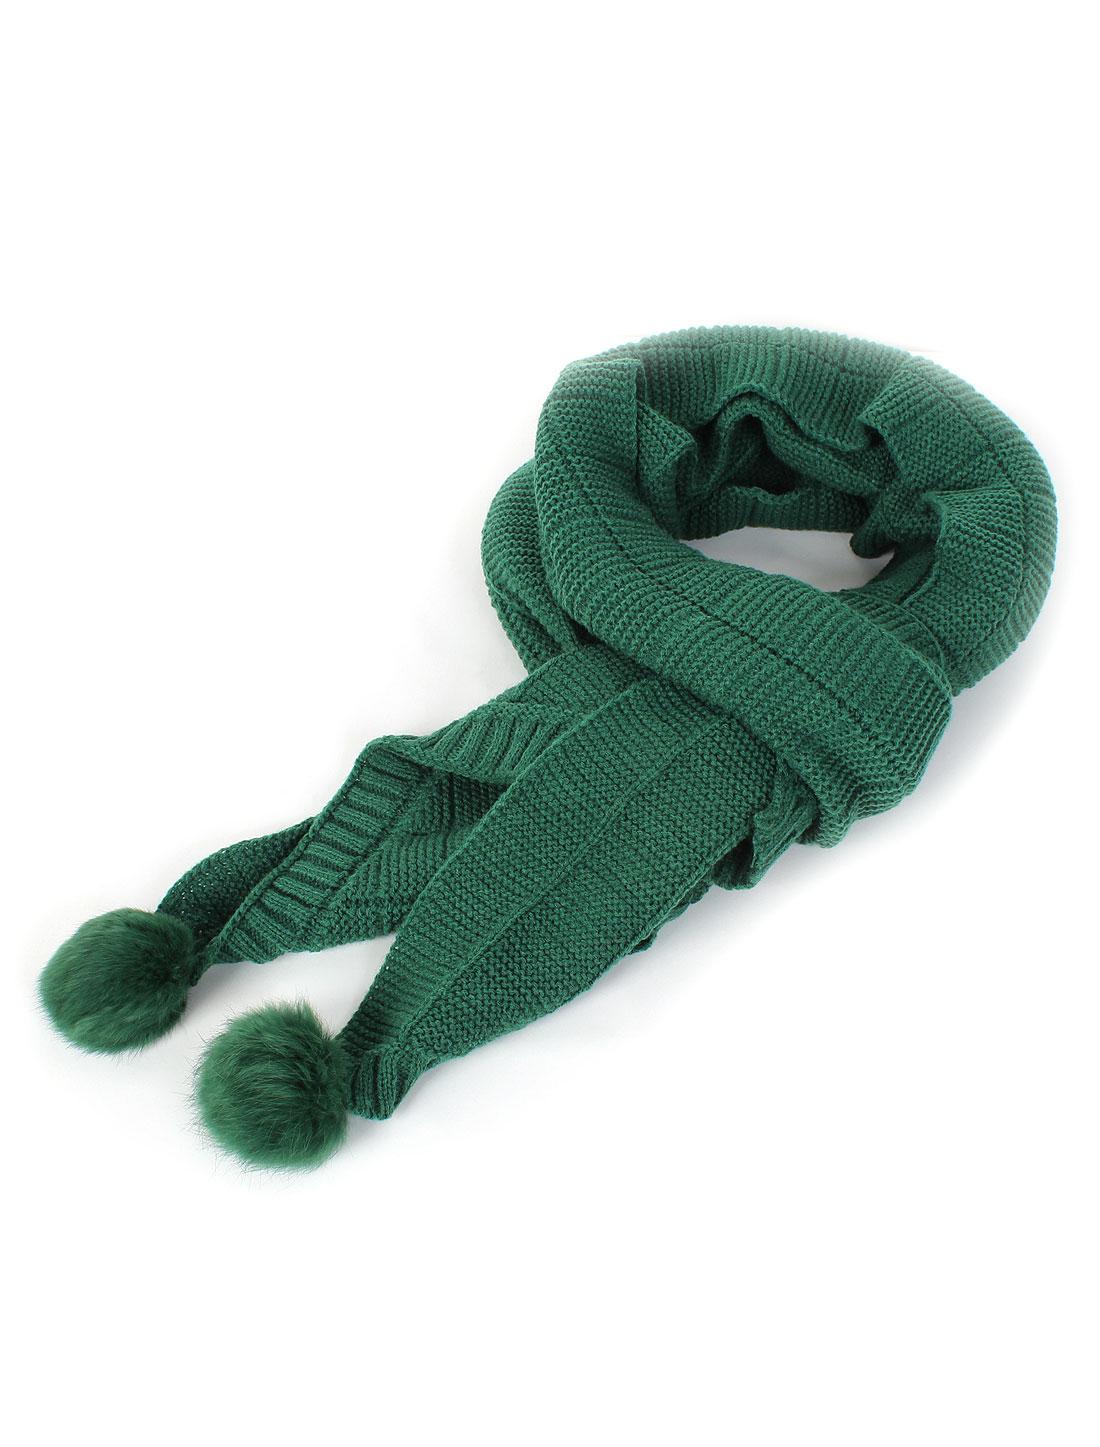 Winter Soft Warm Acrylic Casual Knitted Faux Fur Fluffy Ball Decor Stretchy Scarf Neckerchief